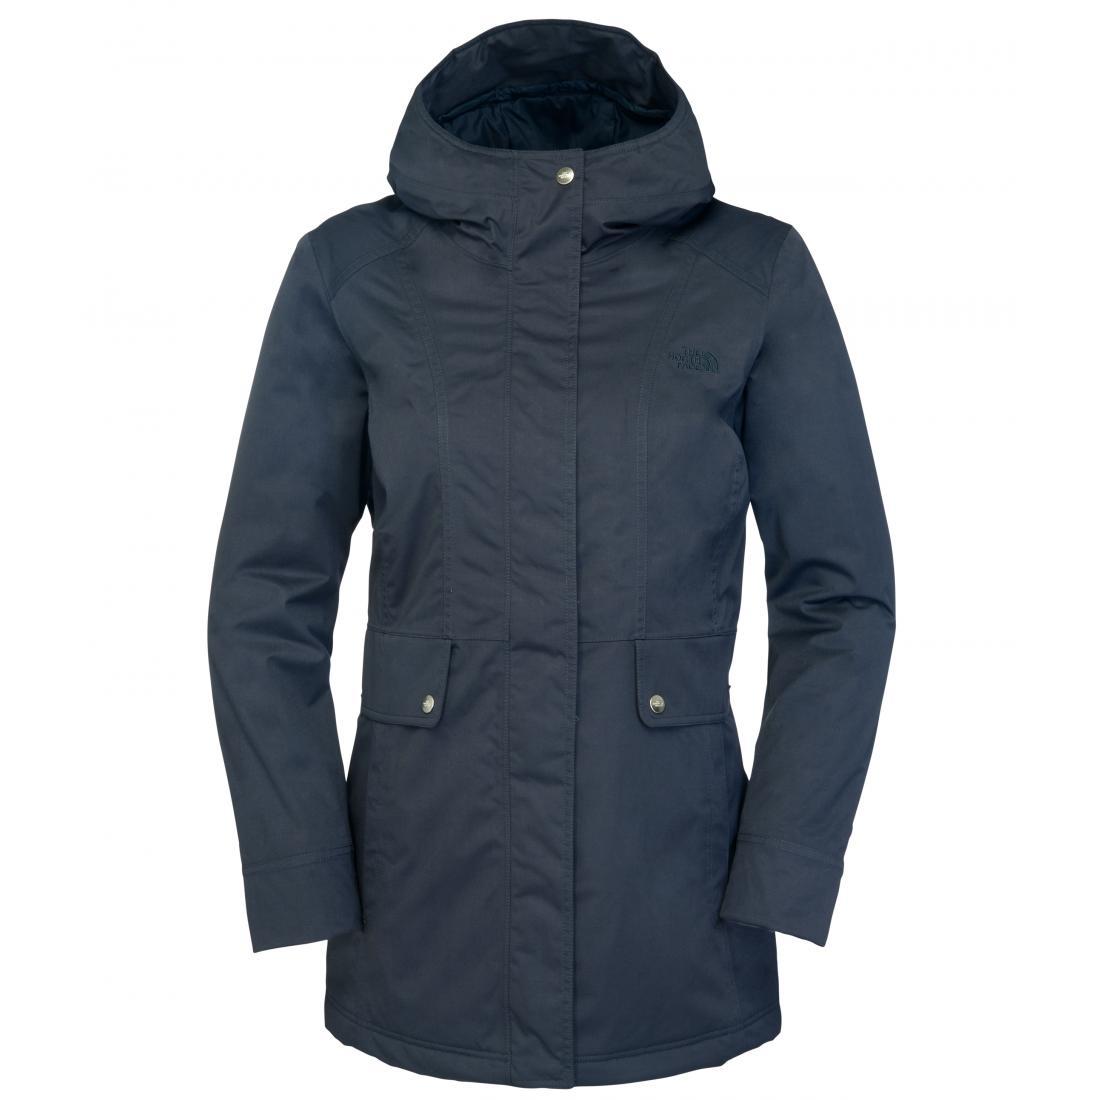 Northface winter coats for women